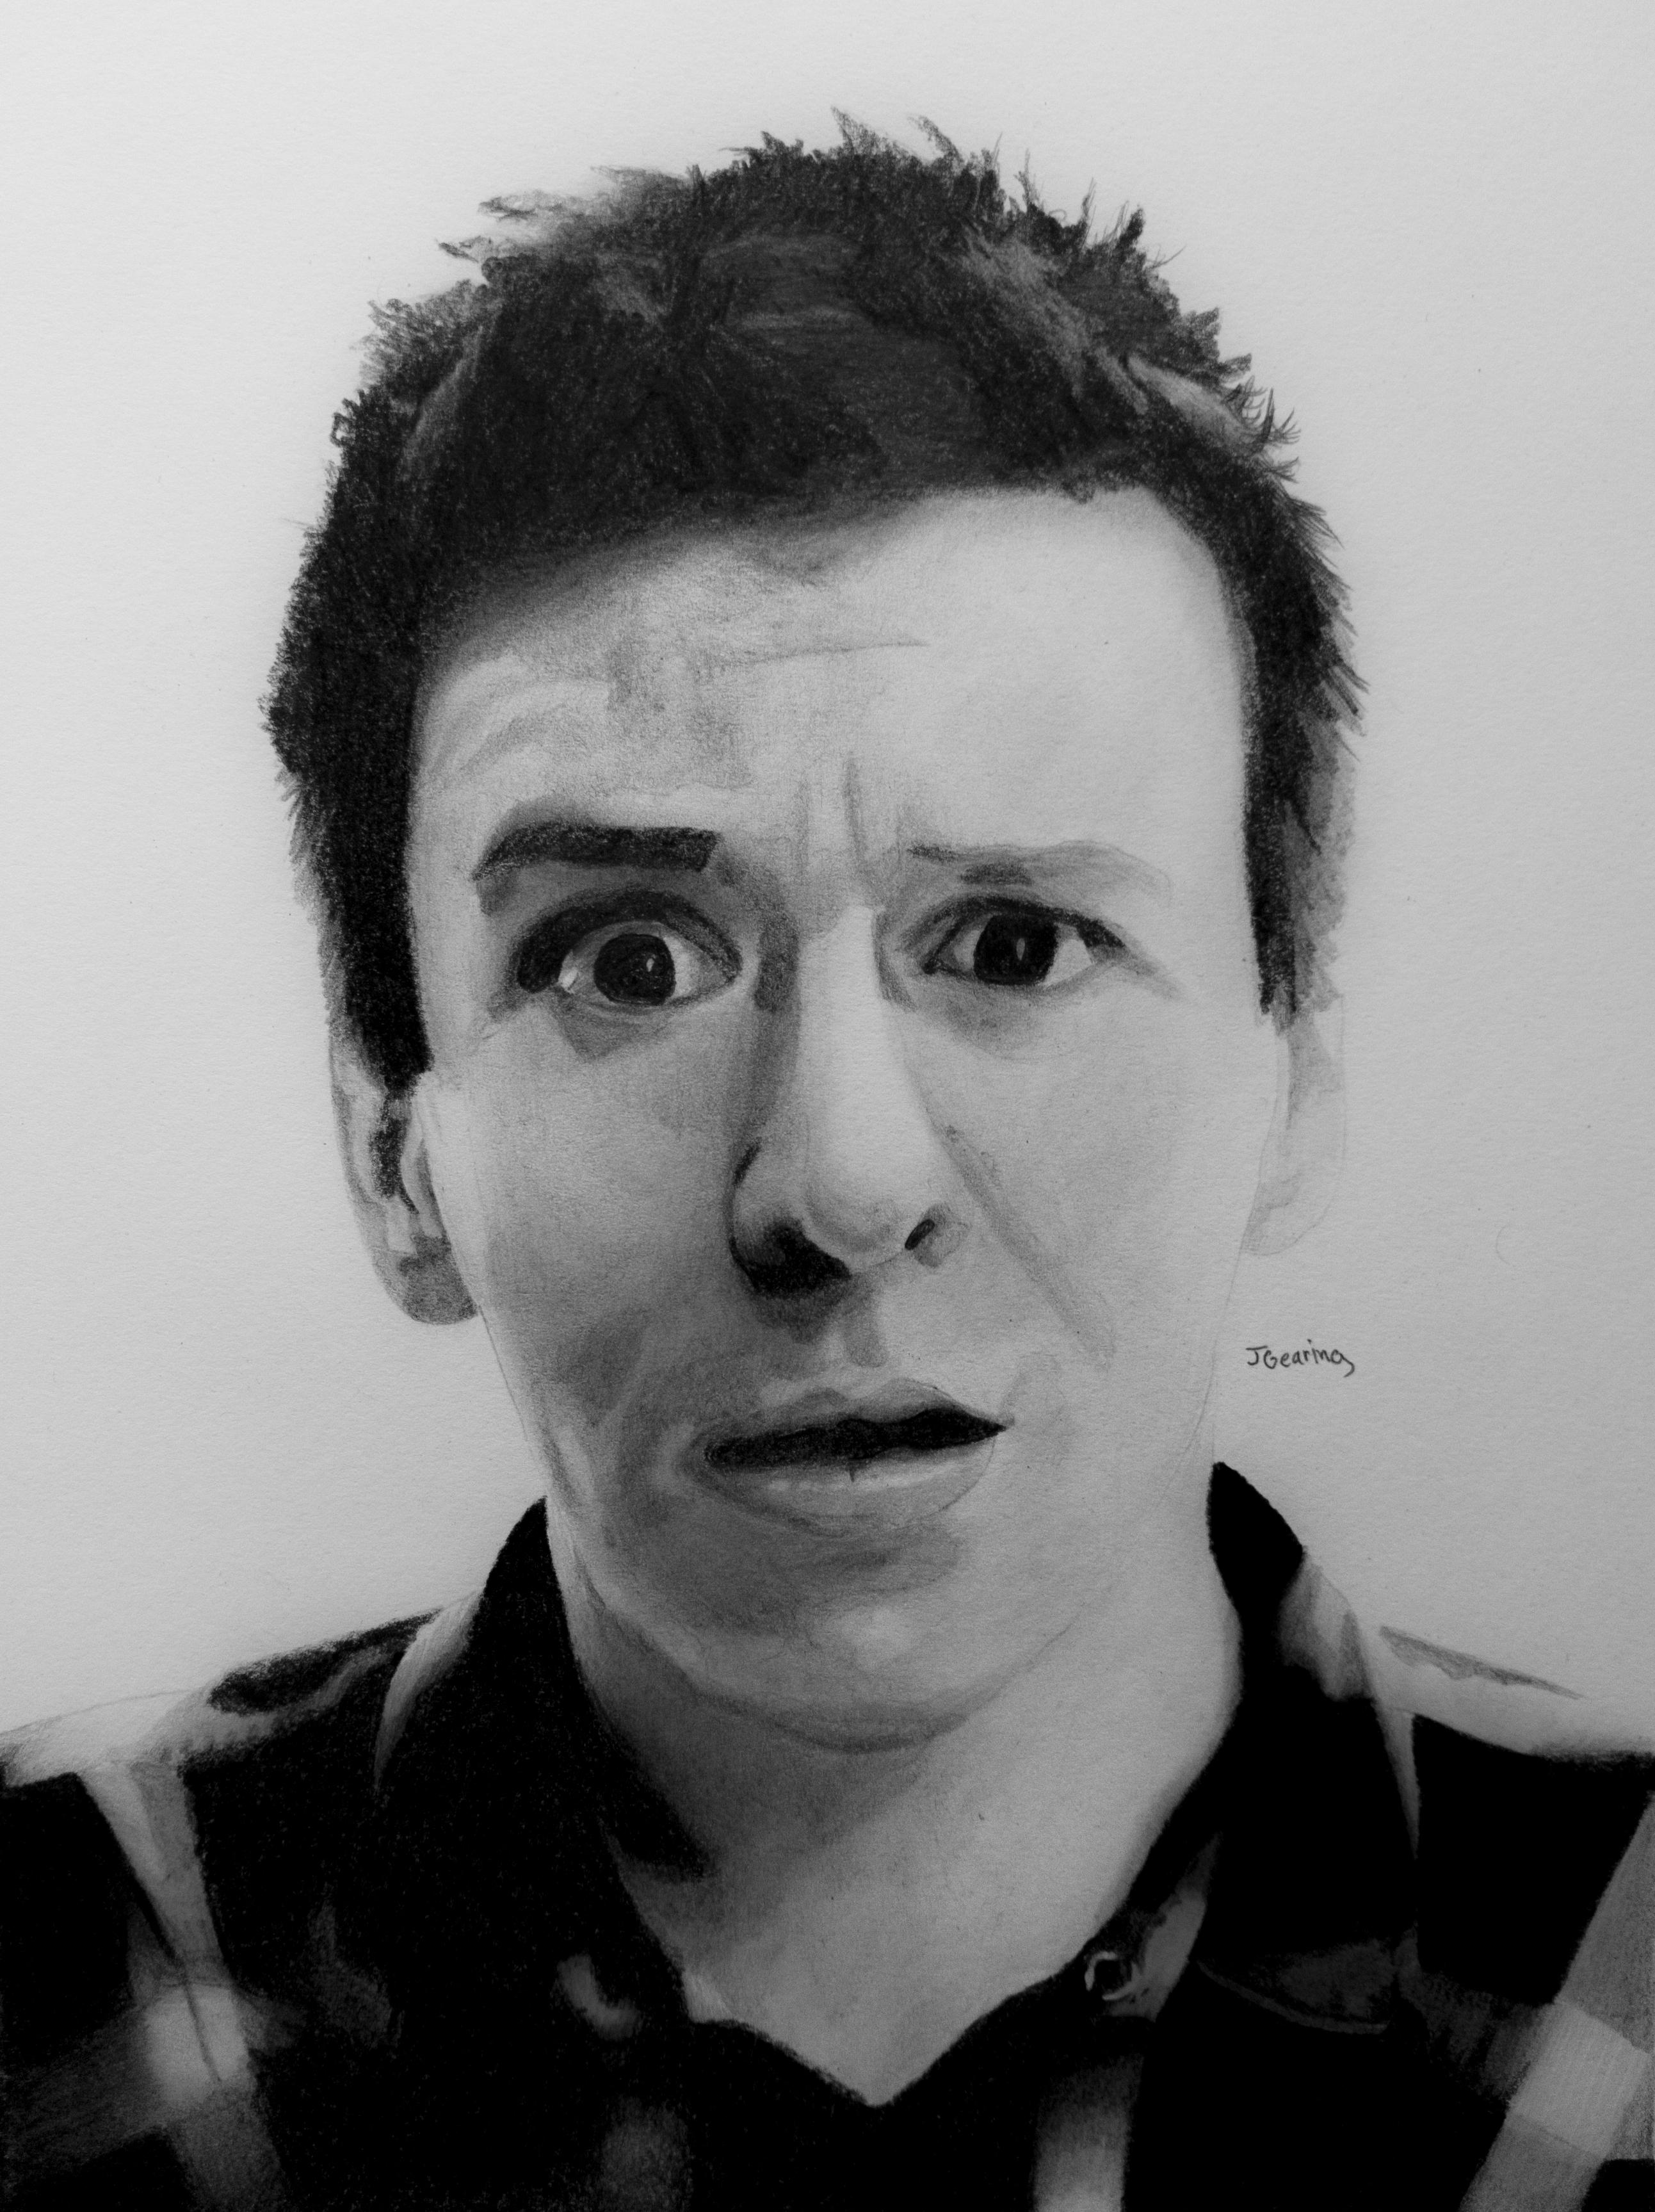 my portrait of philip